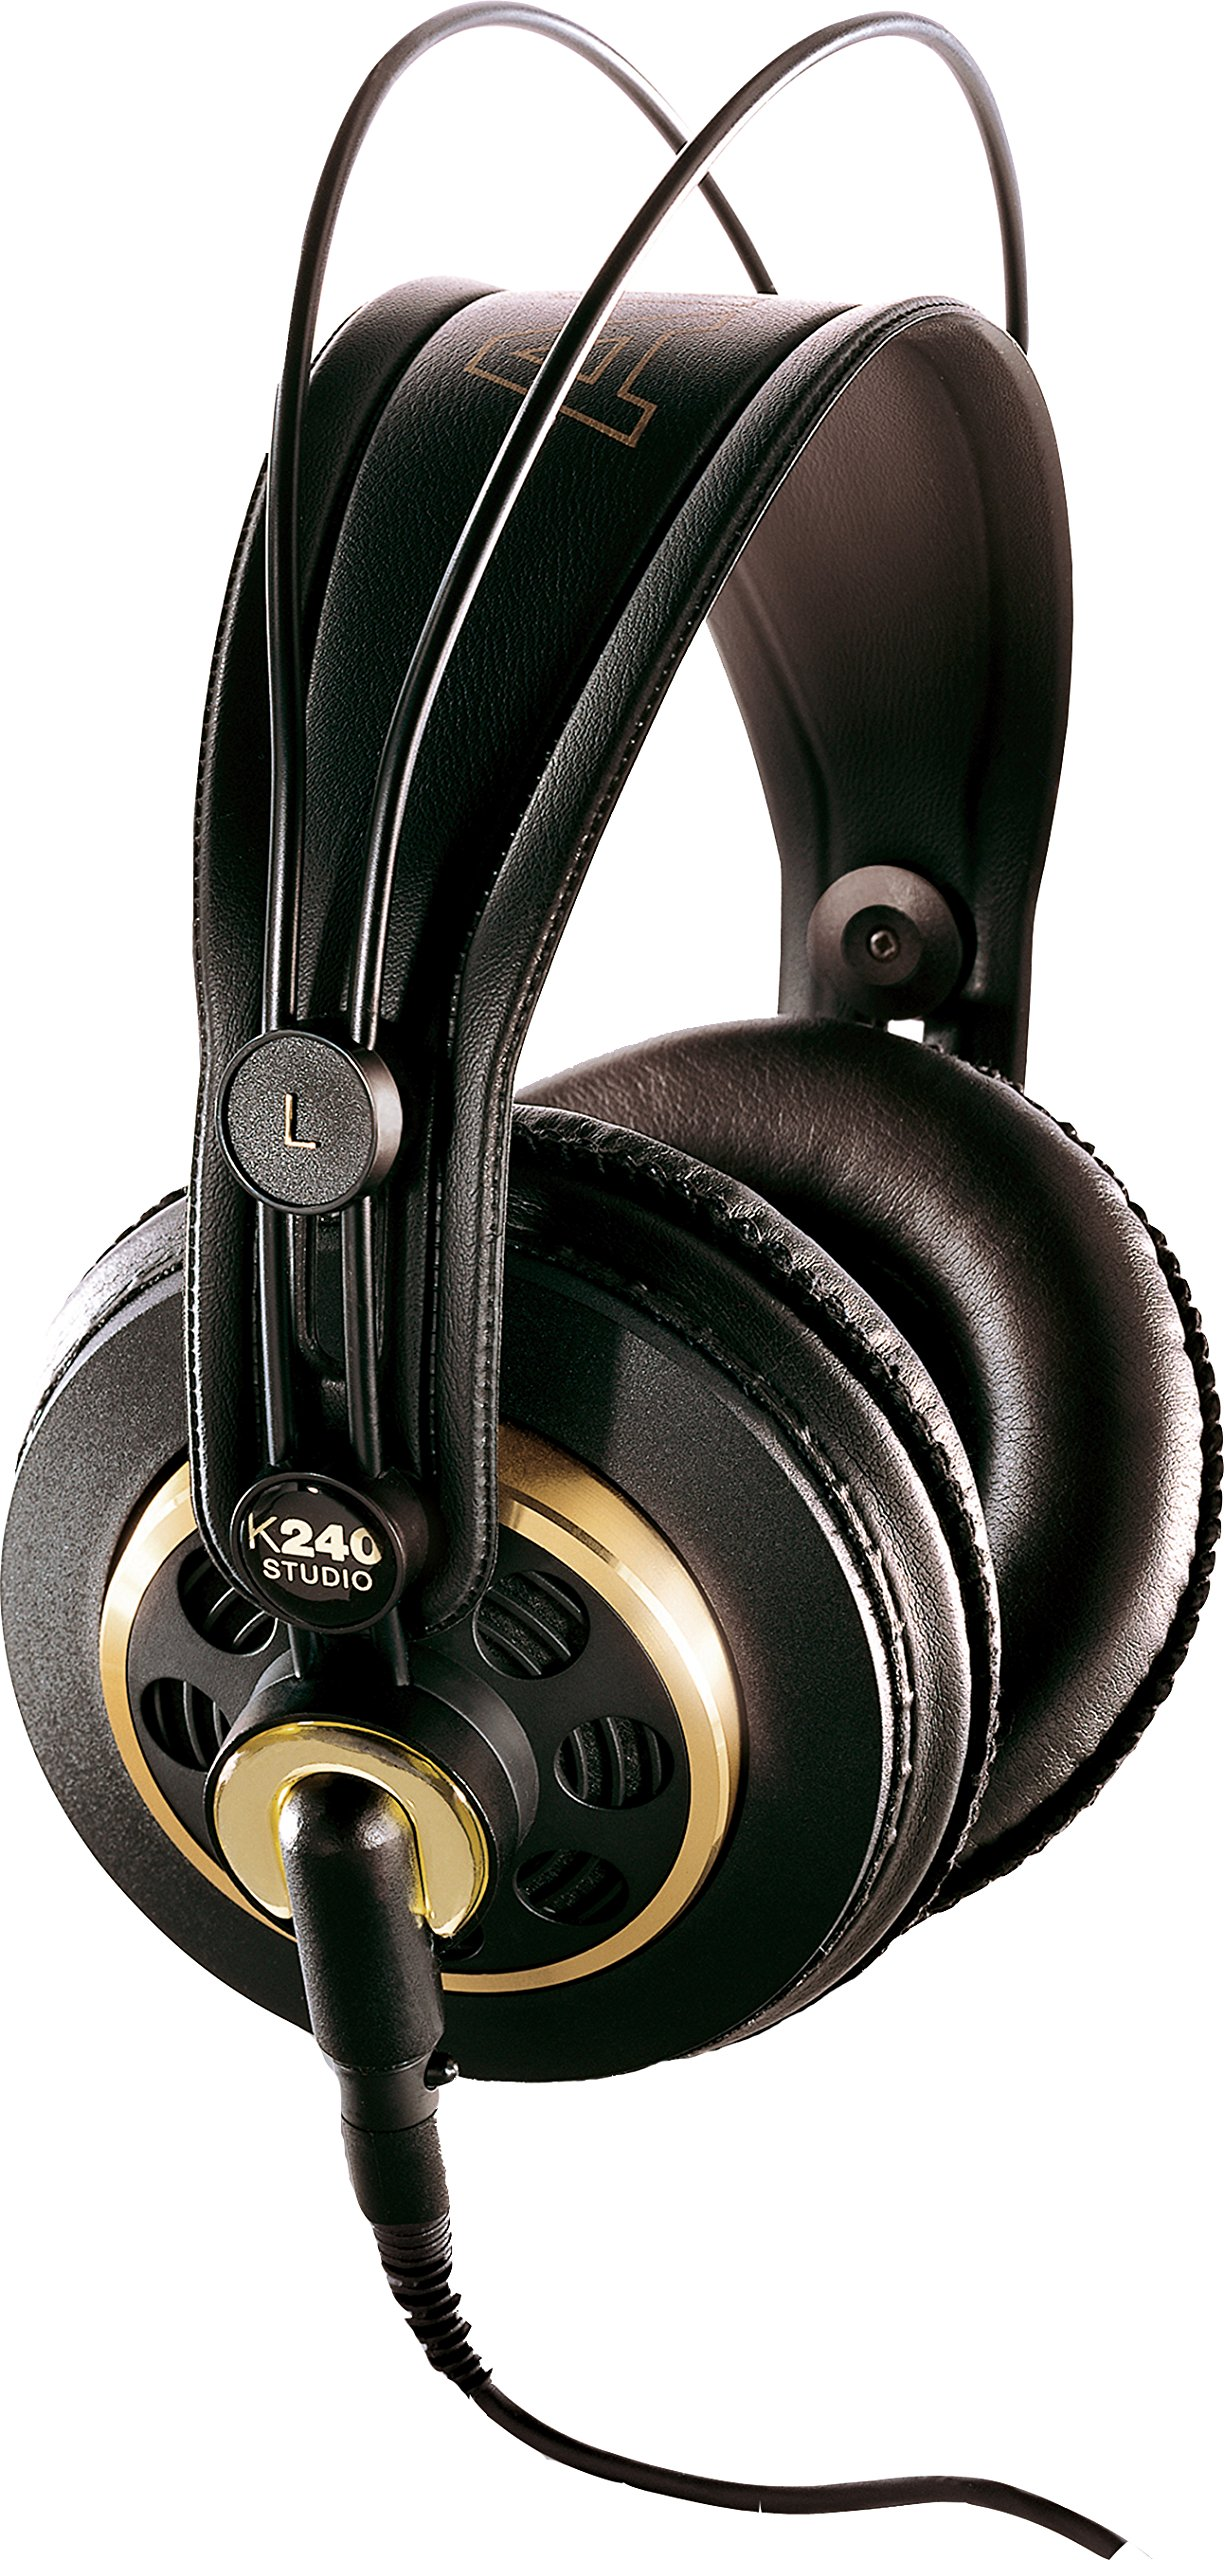 Presonus Studio 68 Audio Interface with AKG K240 Studio Headphones by PreSonus (Image #4)